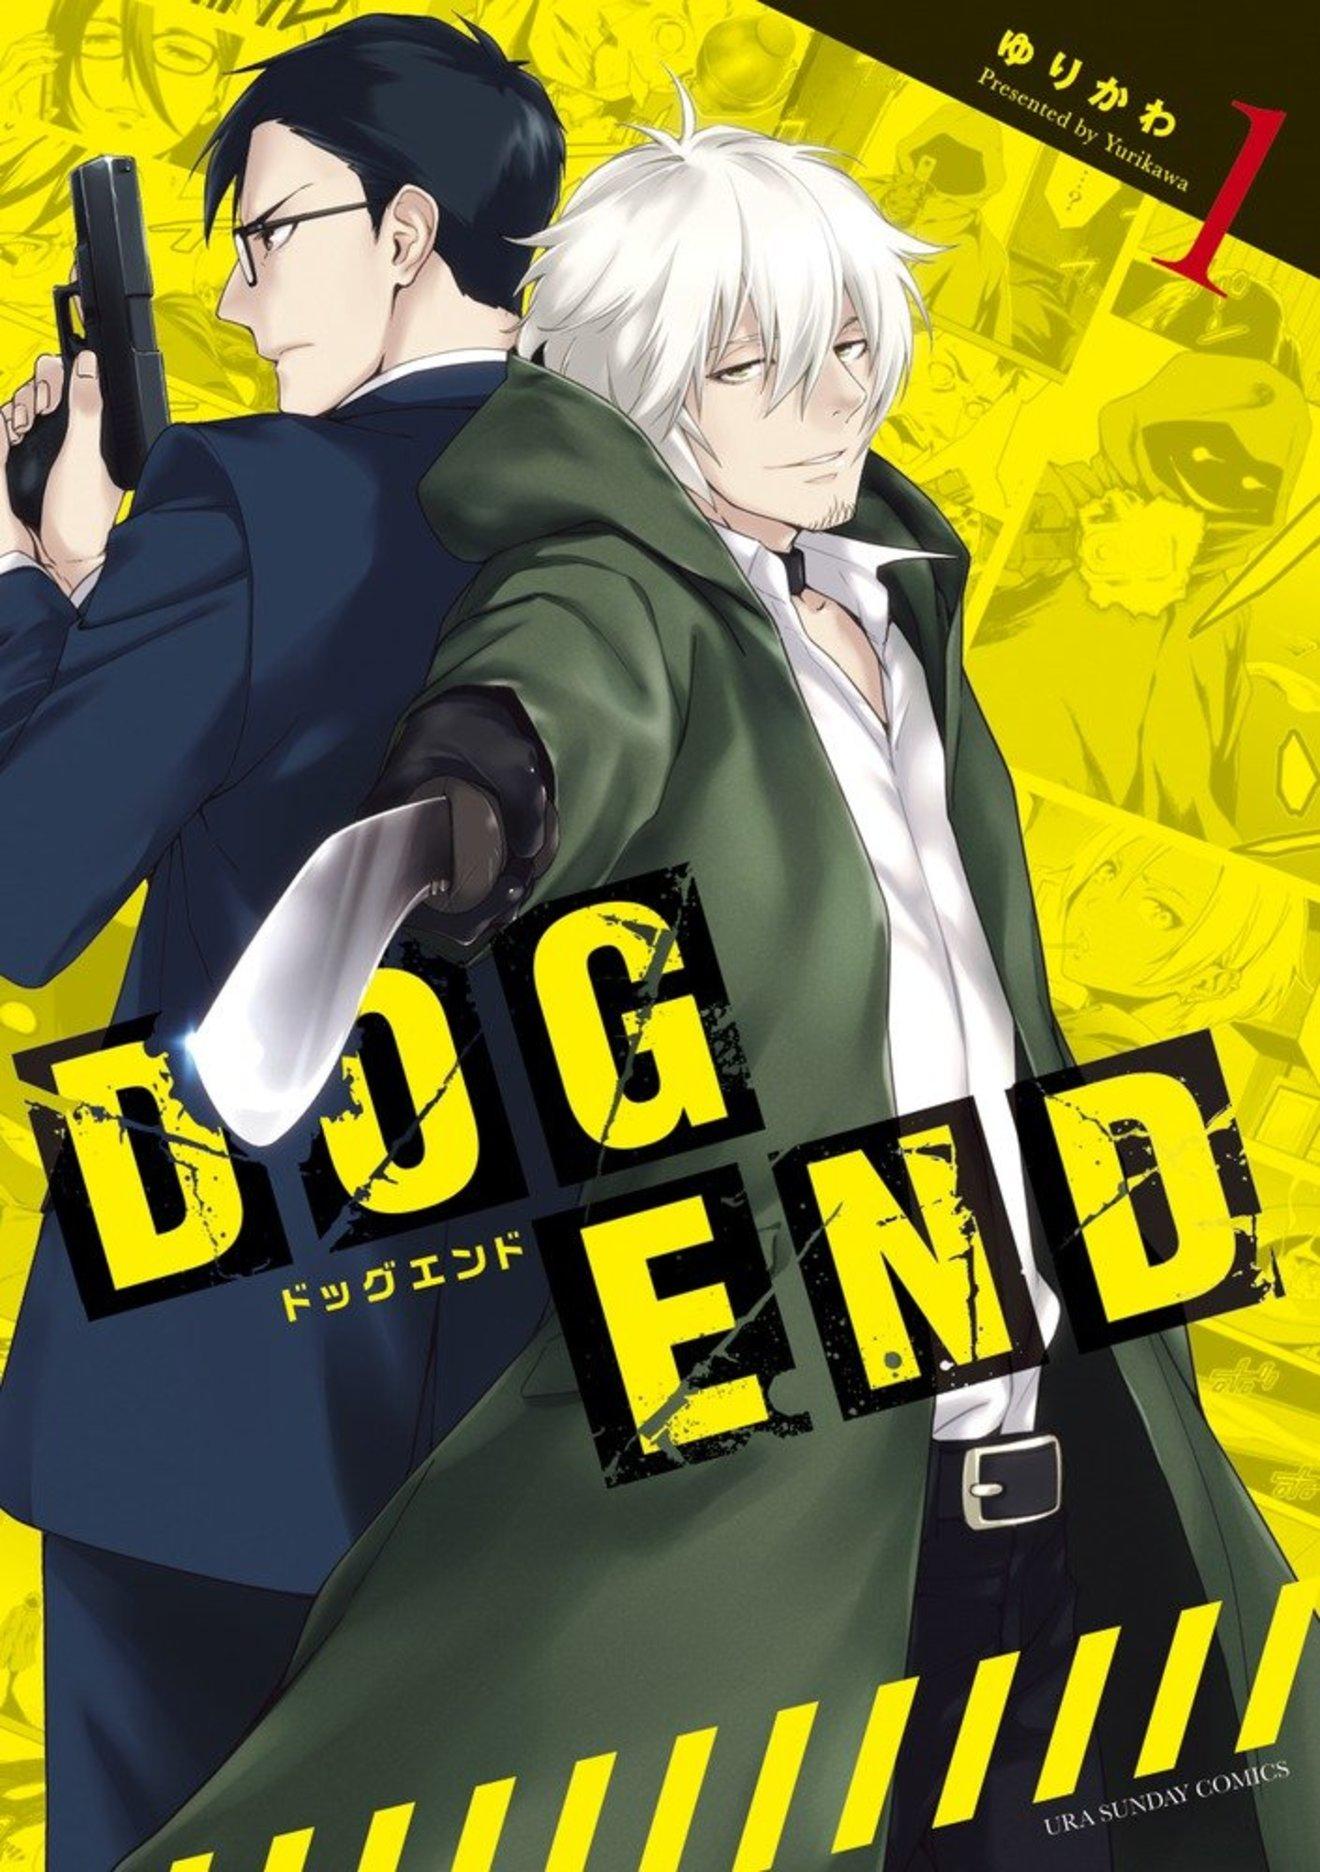 『DOG END』が無料で読める!登場人物と4巻までの見所をネタバレ紹介